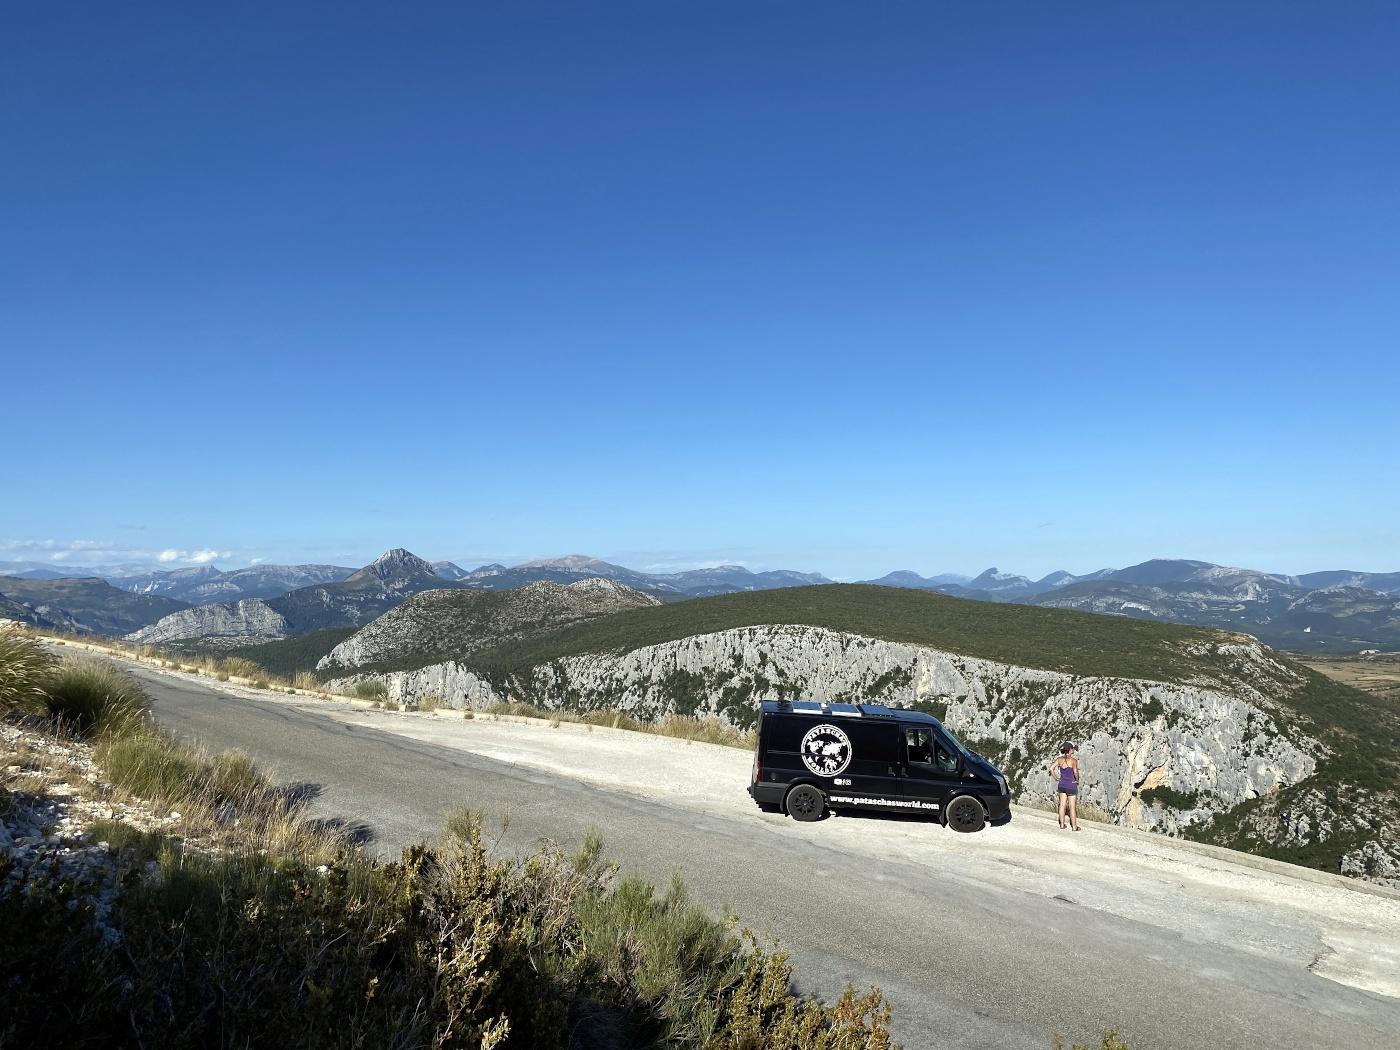 Patascha Frankreich Route des Grandes Alpes Roadtrip Gorges du Verdon Schlucht Canyon Wohnmobil Panorama Strasse